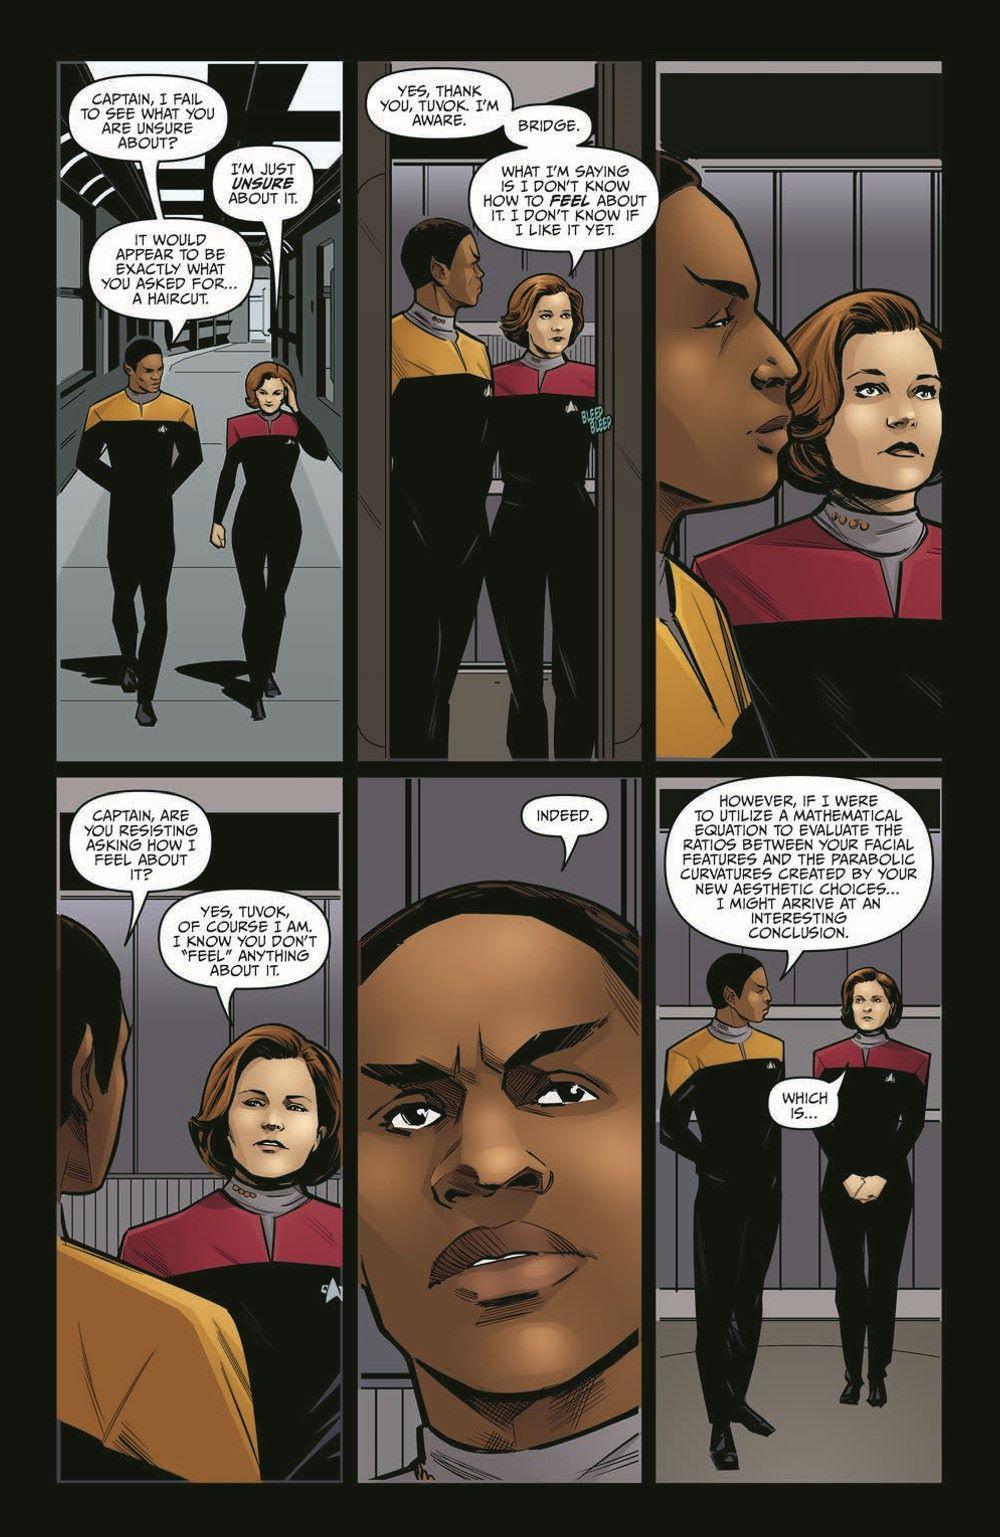 ST_Voyager_SR01-pr-6 ComicList Previews: STAR TREK VOYAGER SEVEN'S RECKONING #1 (OF 4)